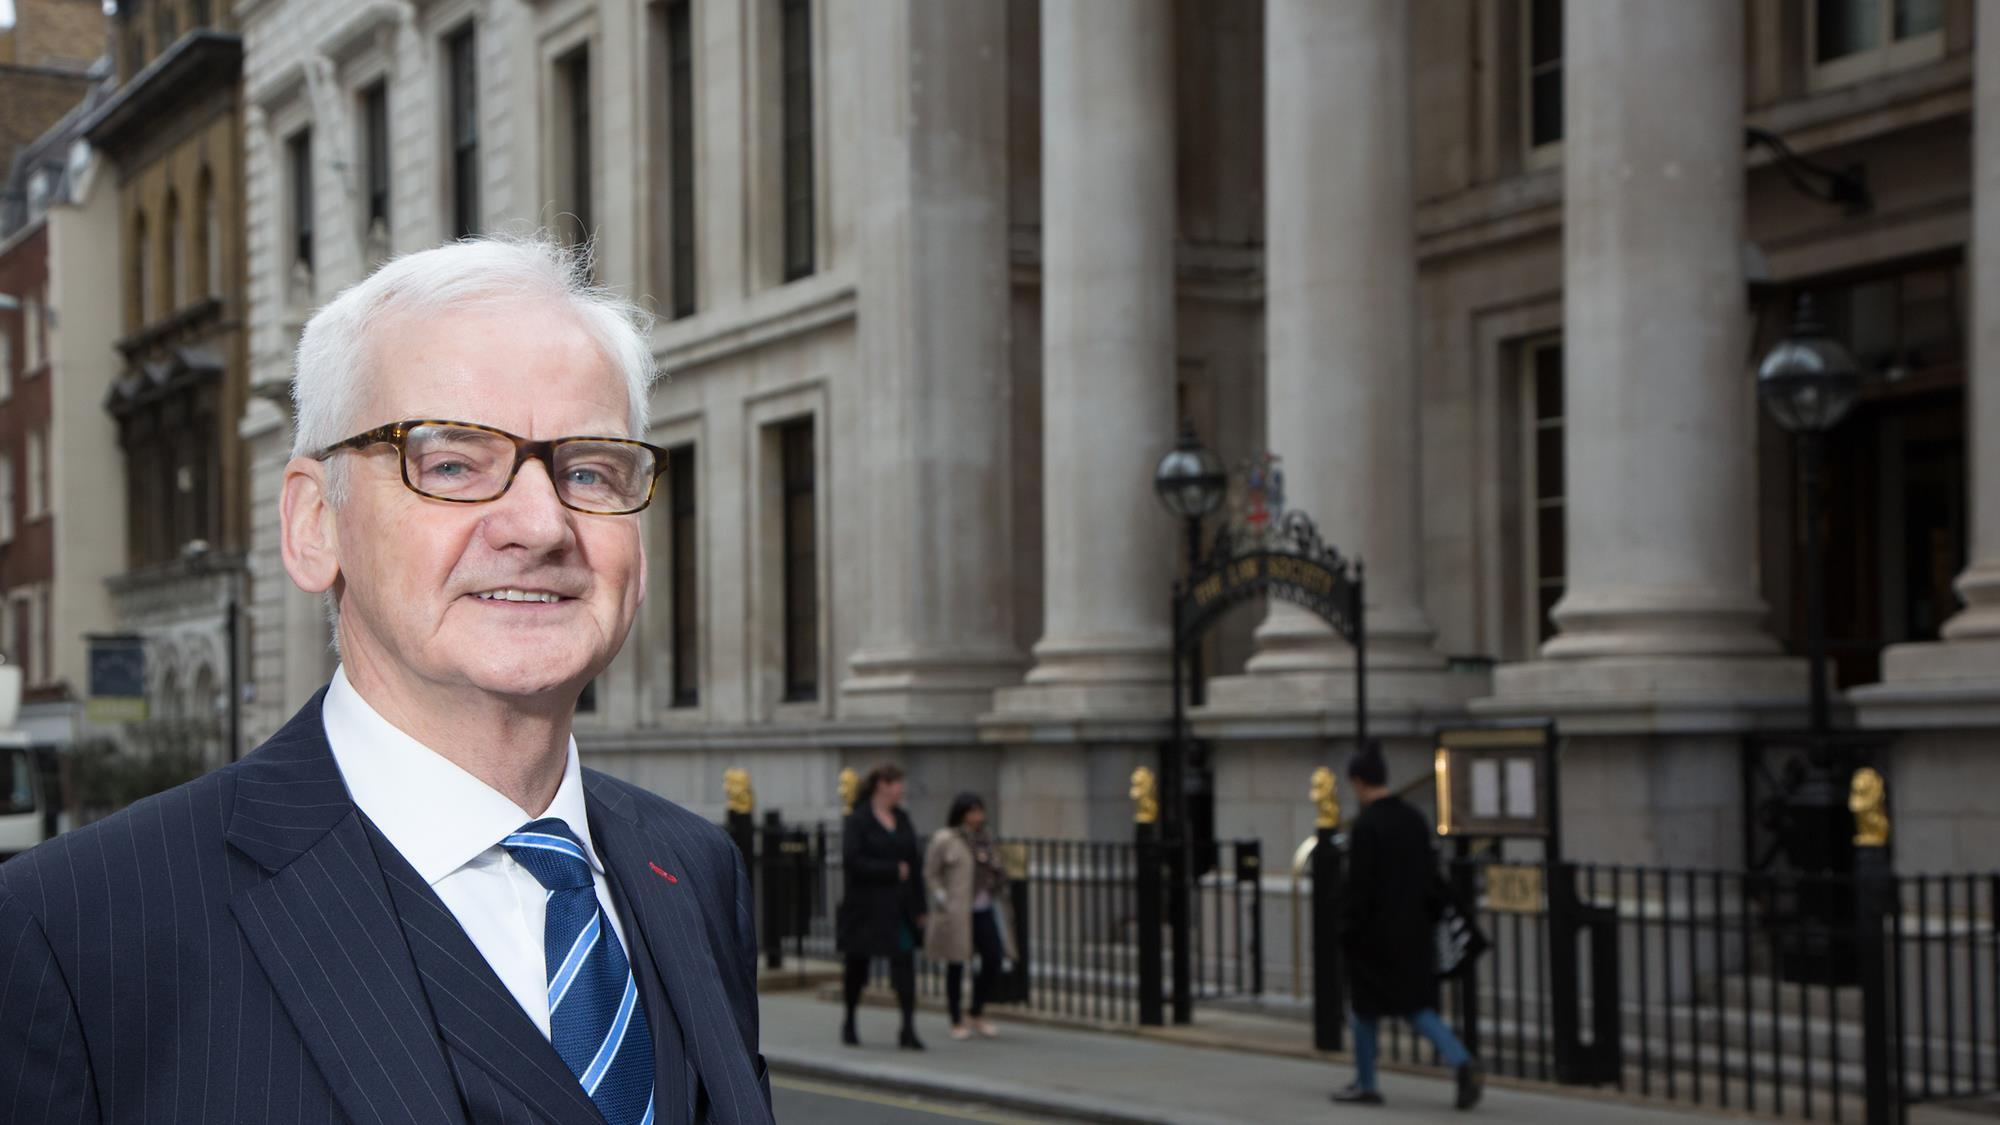 Joe Egan, New Law Society President